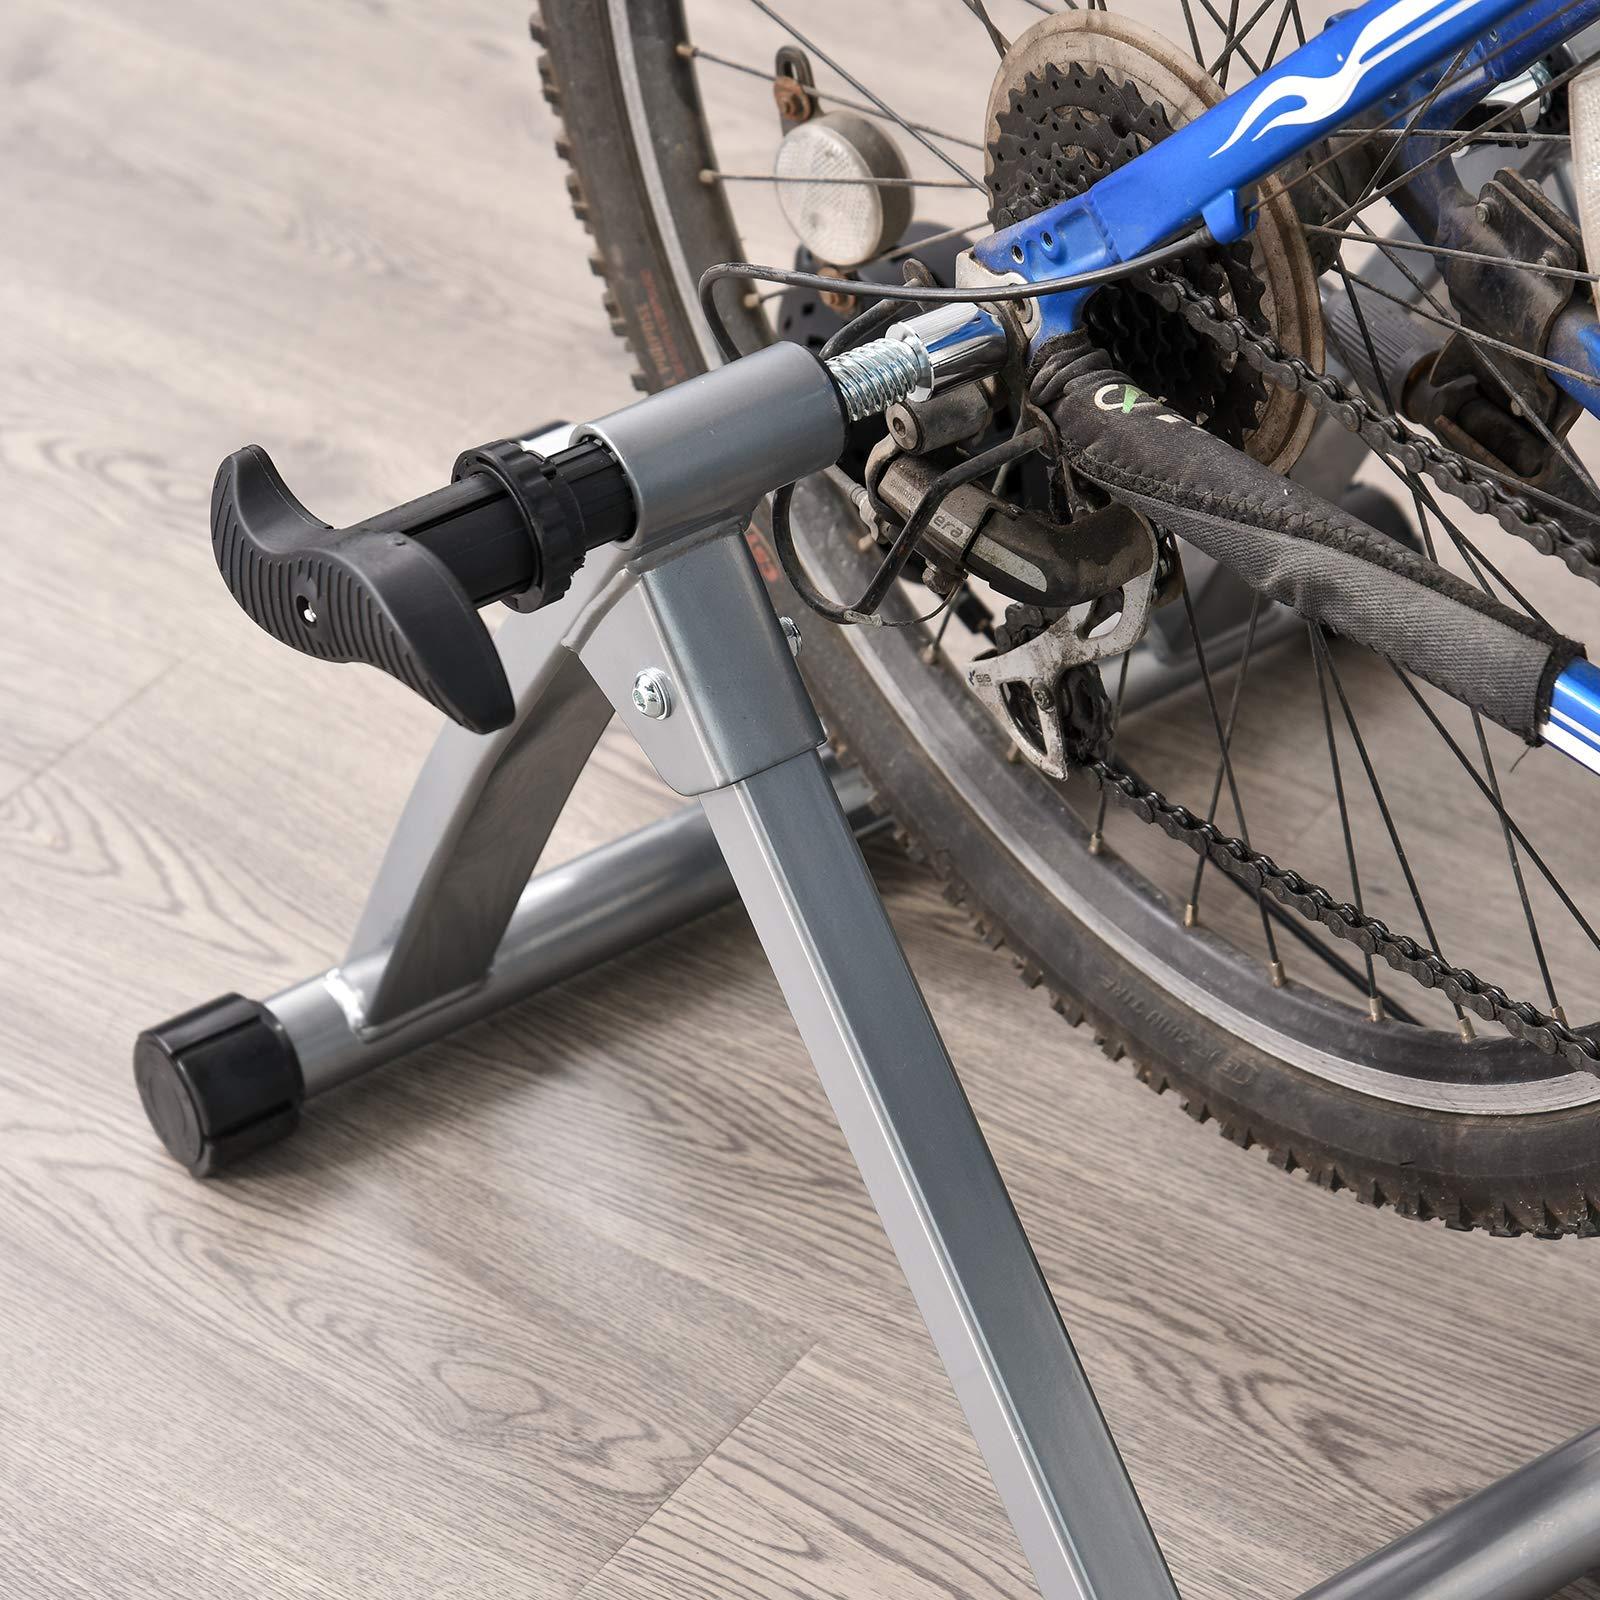 HOMCOM Rodillo Entrenamiento Bicicleta 5 Niveles de Resistencia ...